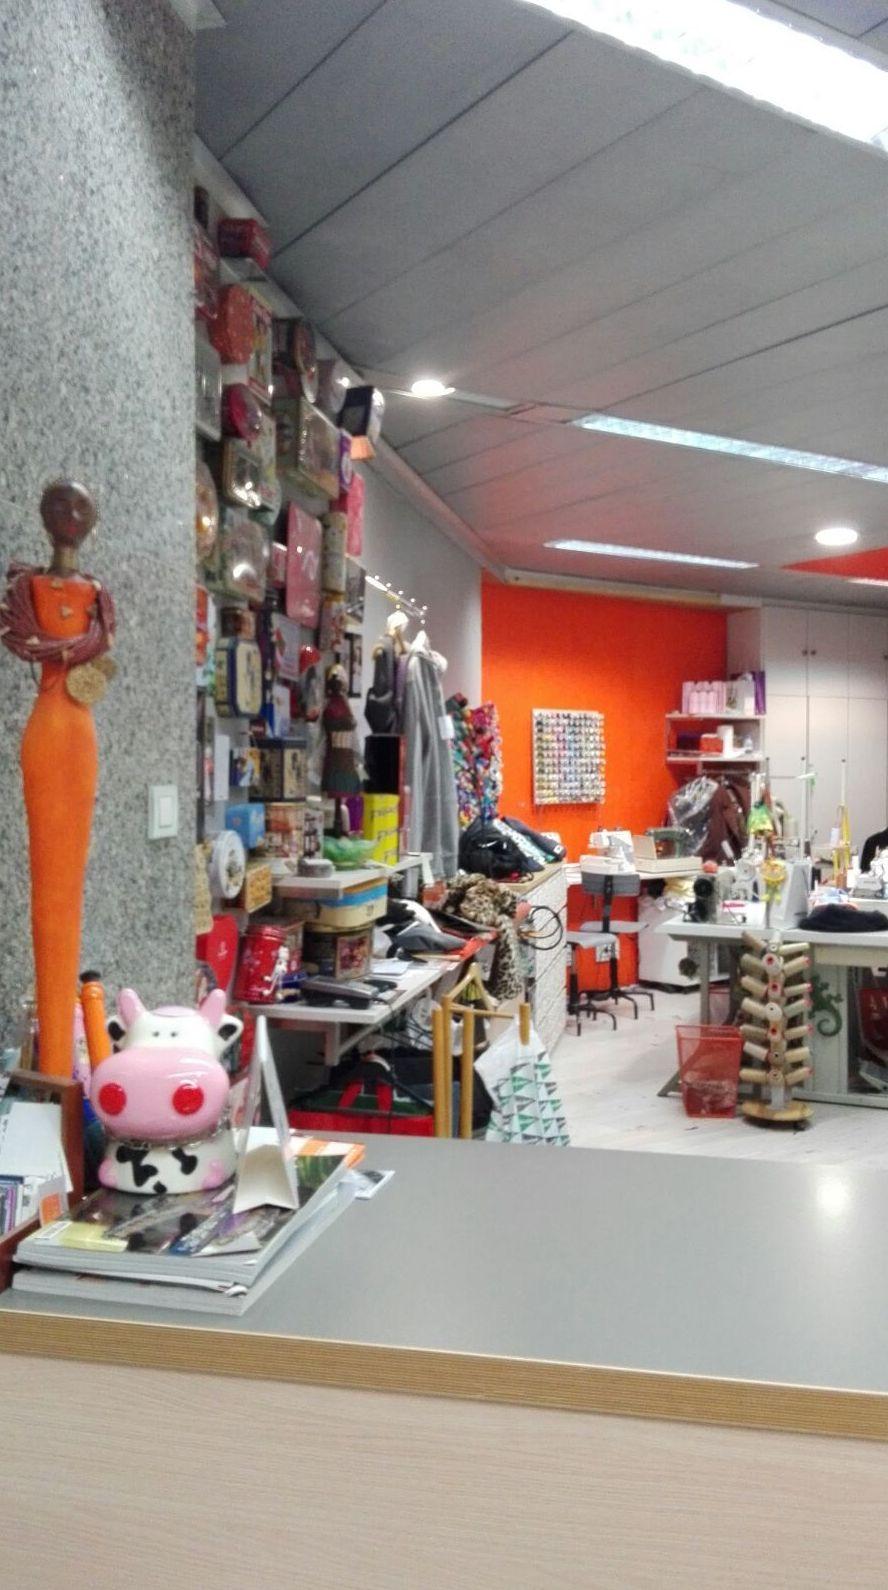 Foto 11 de Arreglos de ropa en Bilbao | A'Coser